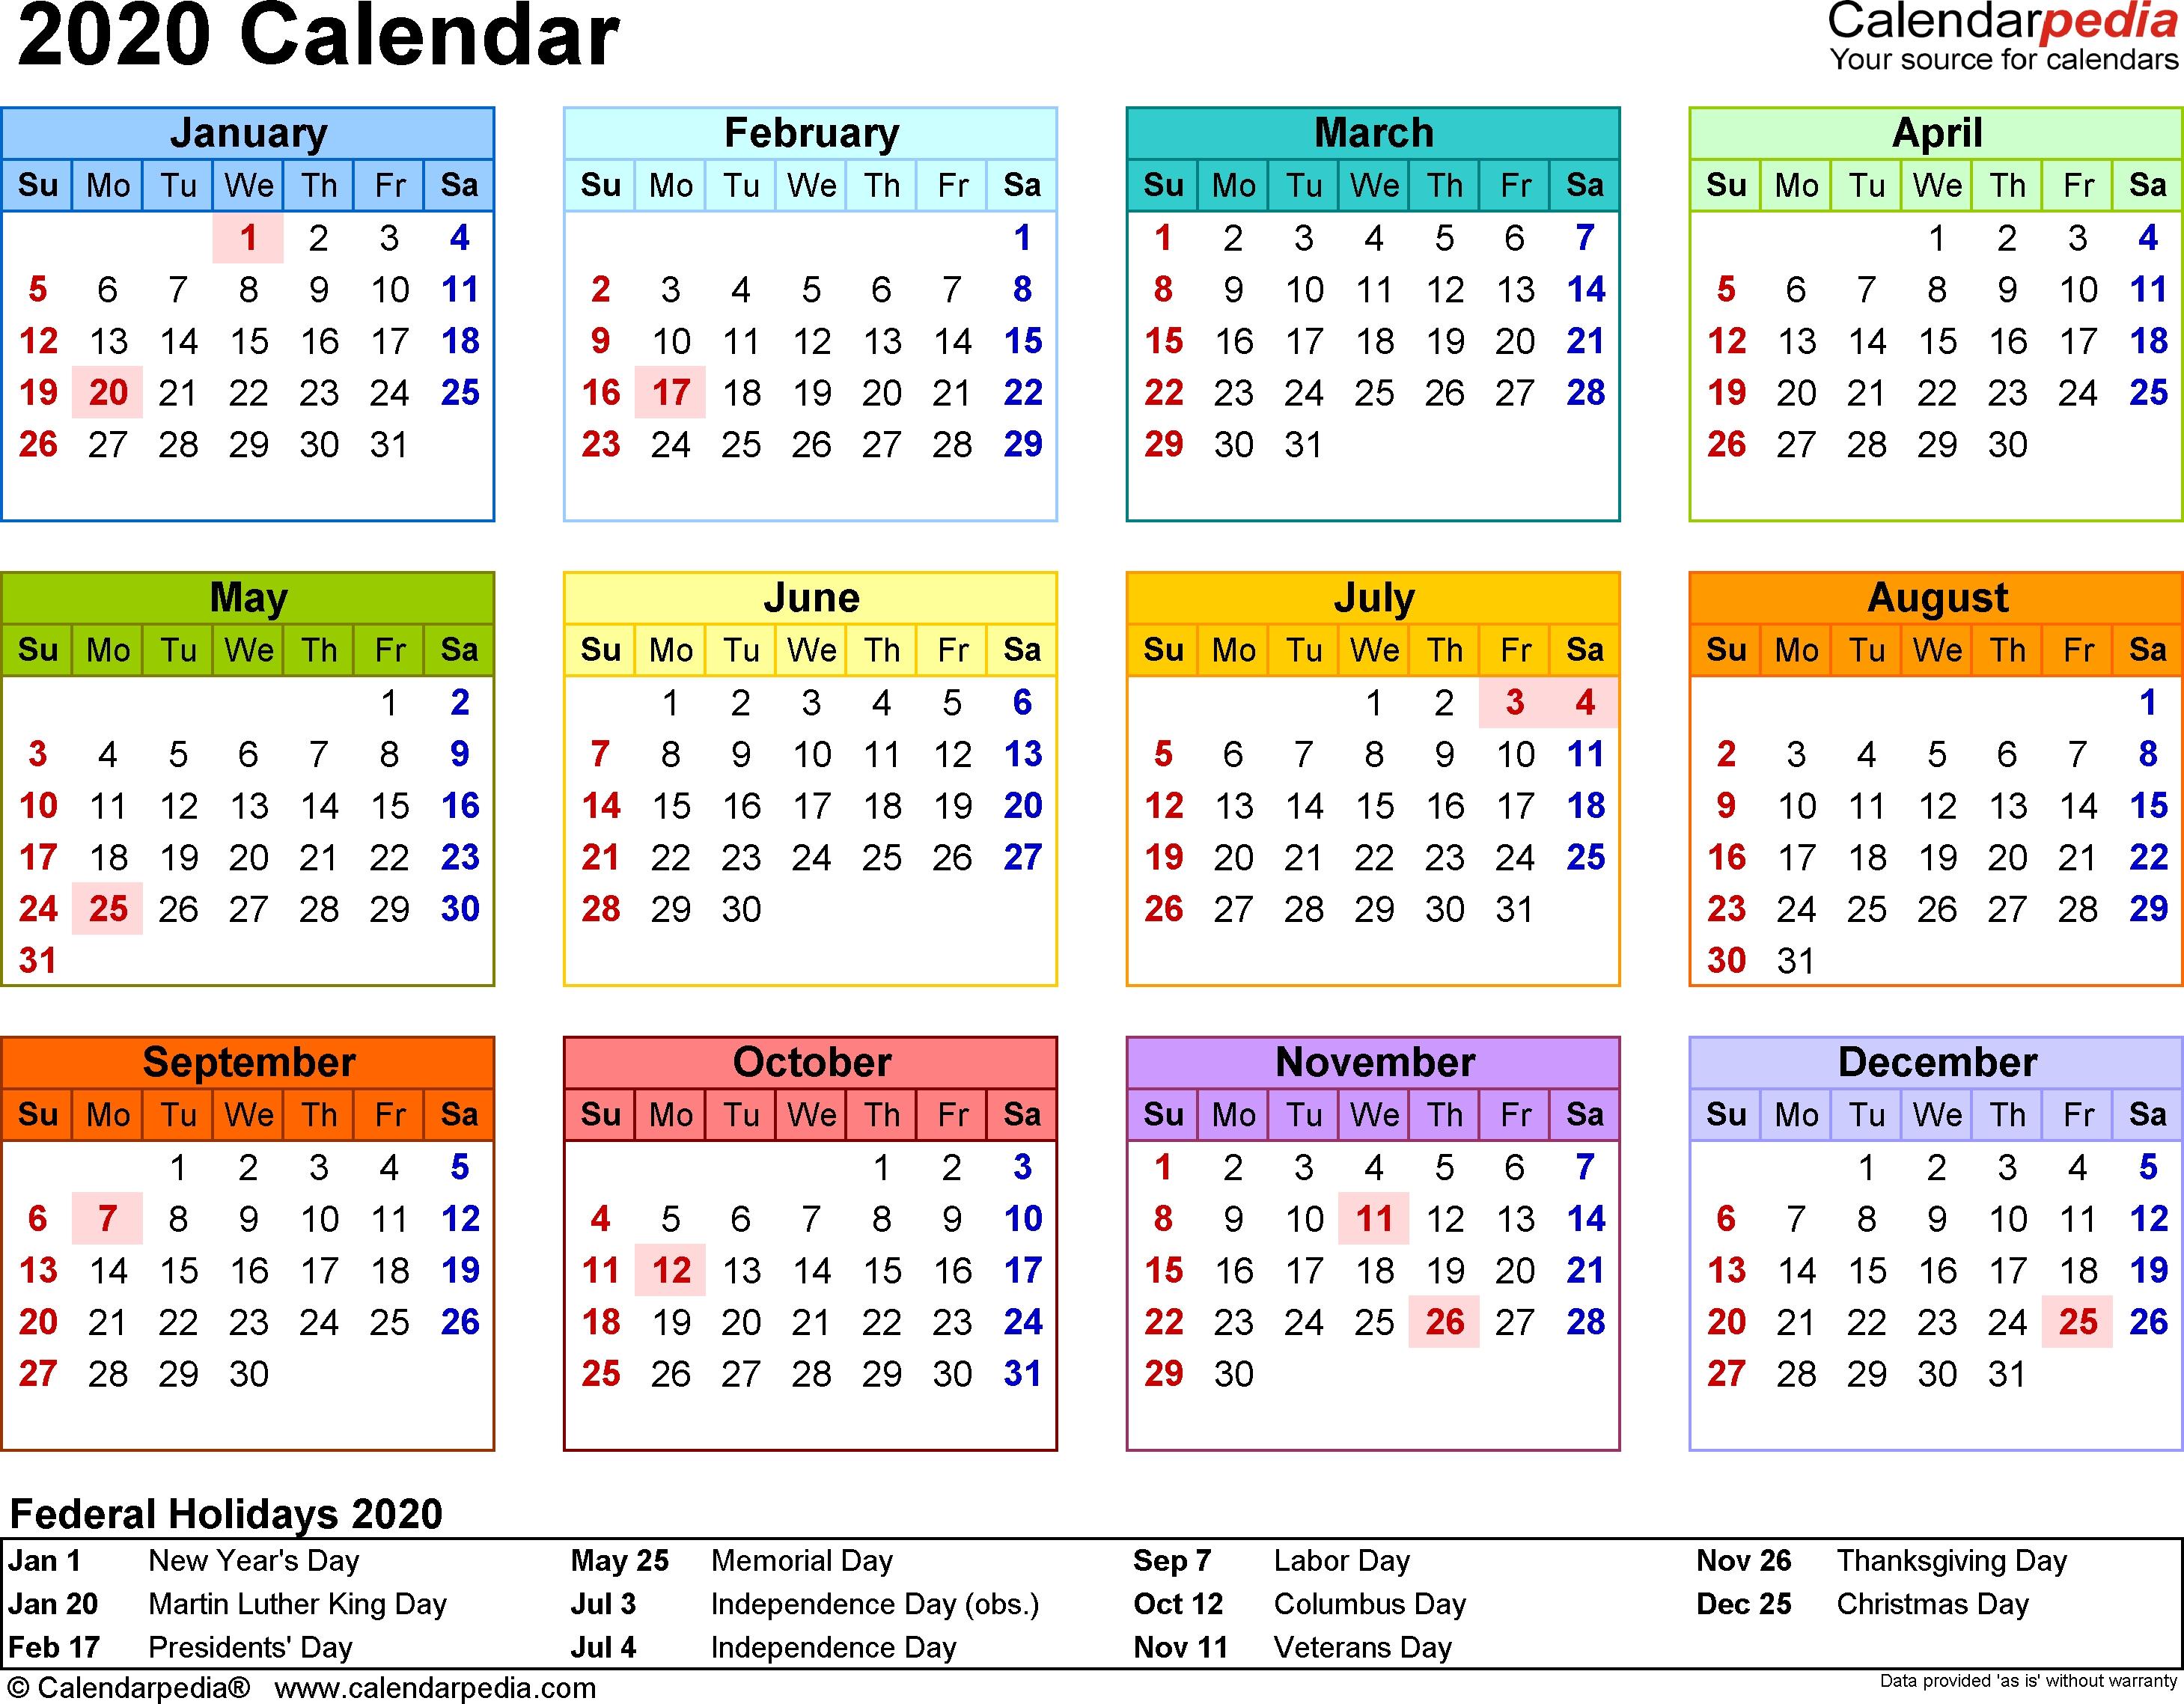 2020 Calendar - Free Printable Microsoft Word Templates Calendarpedia 2020 Printable South Africa